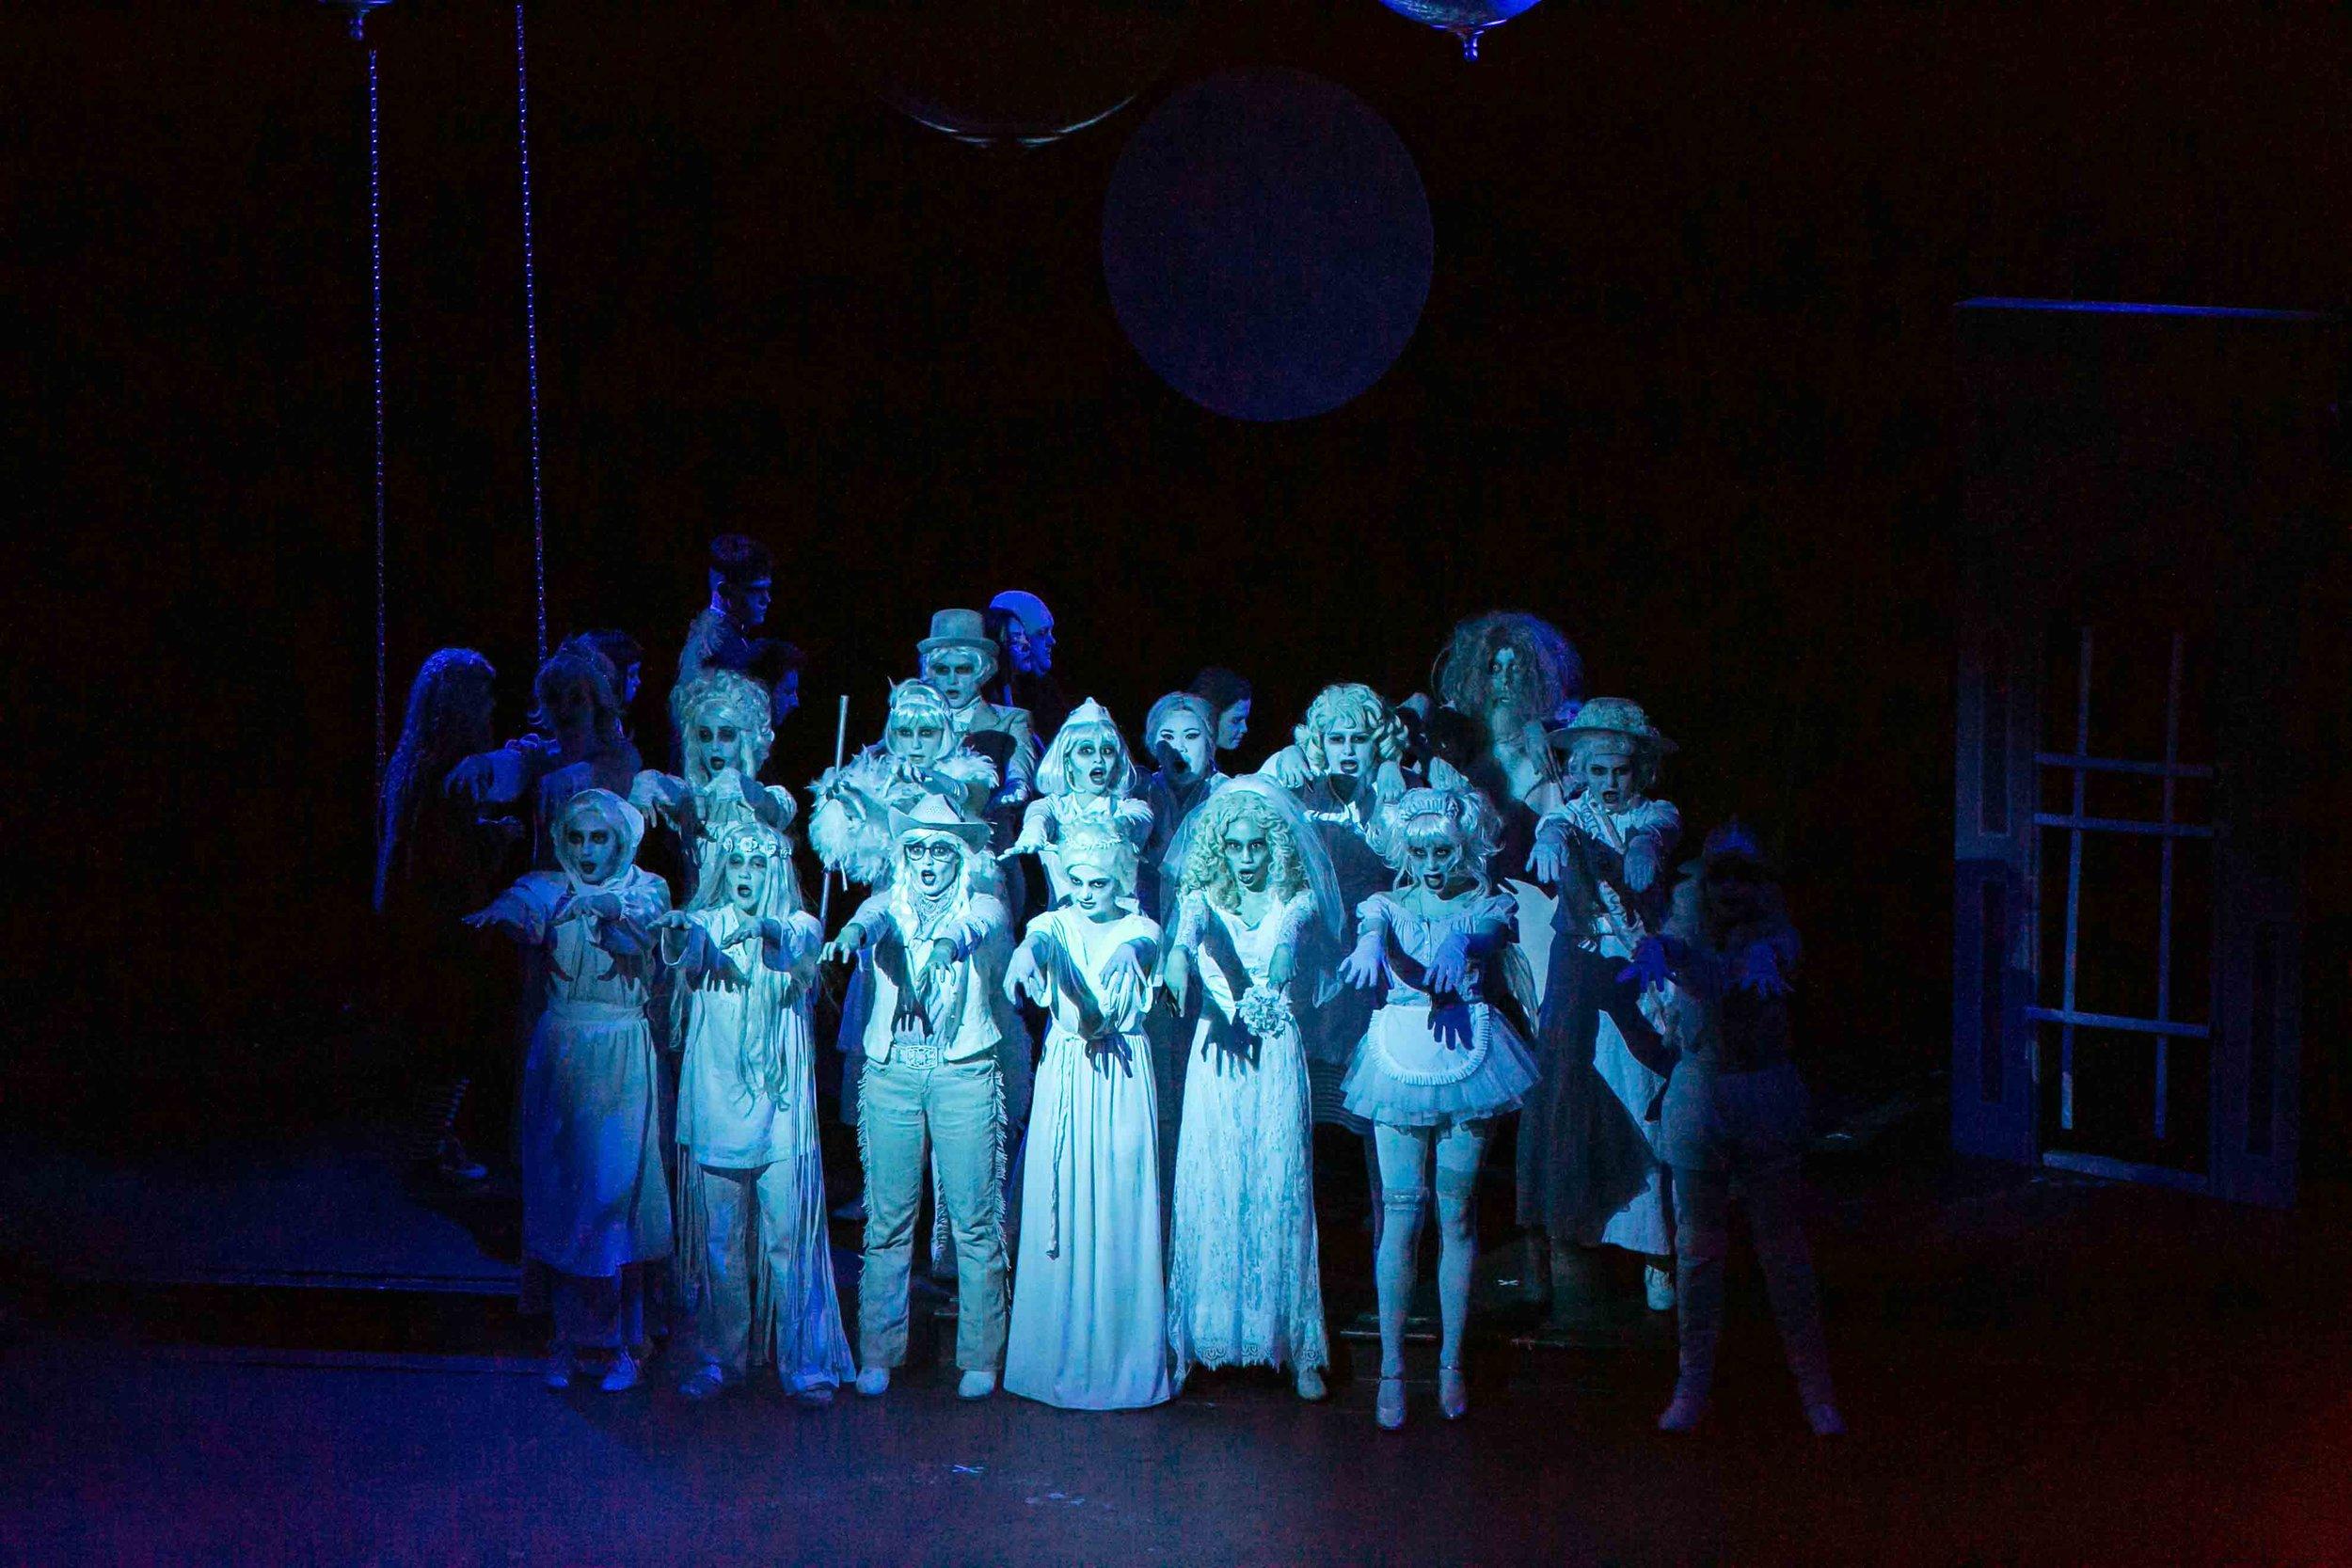 6-19-16 Addams Family Kooky Cast 0042.jpg